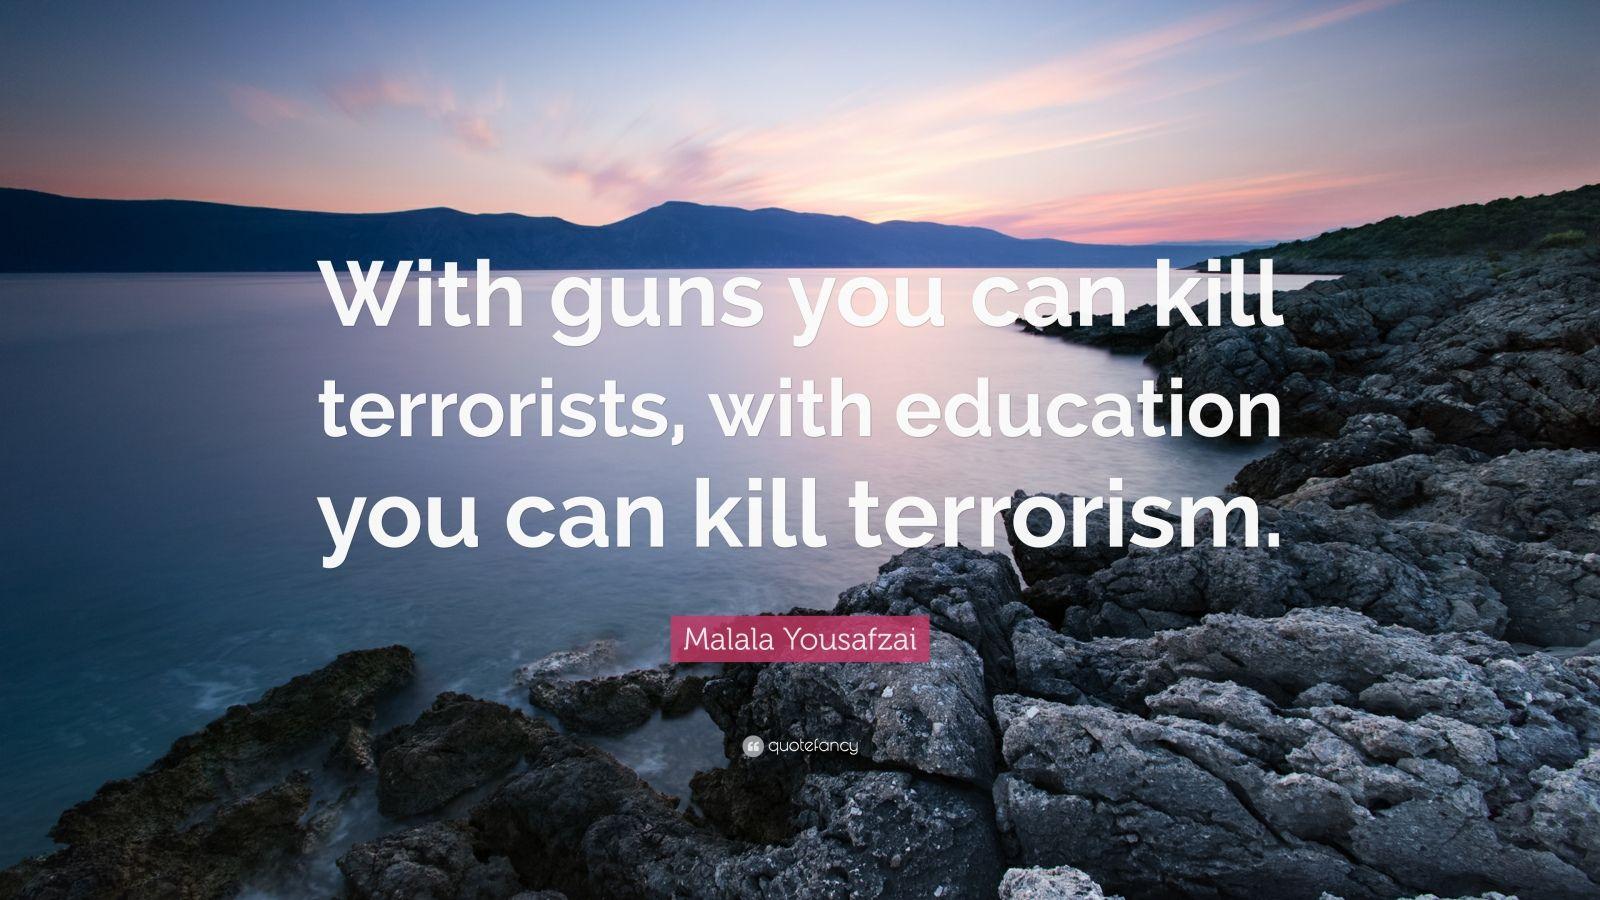 Malala Yousafzai Quotes 100 Wallpapers Quotefancy